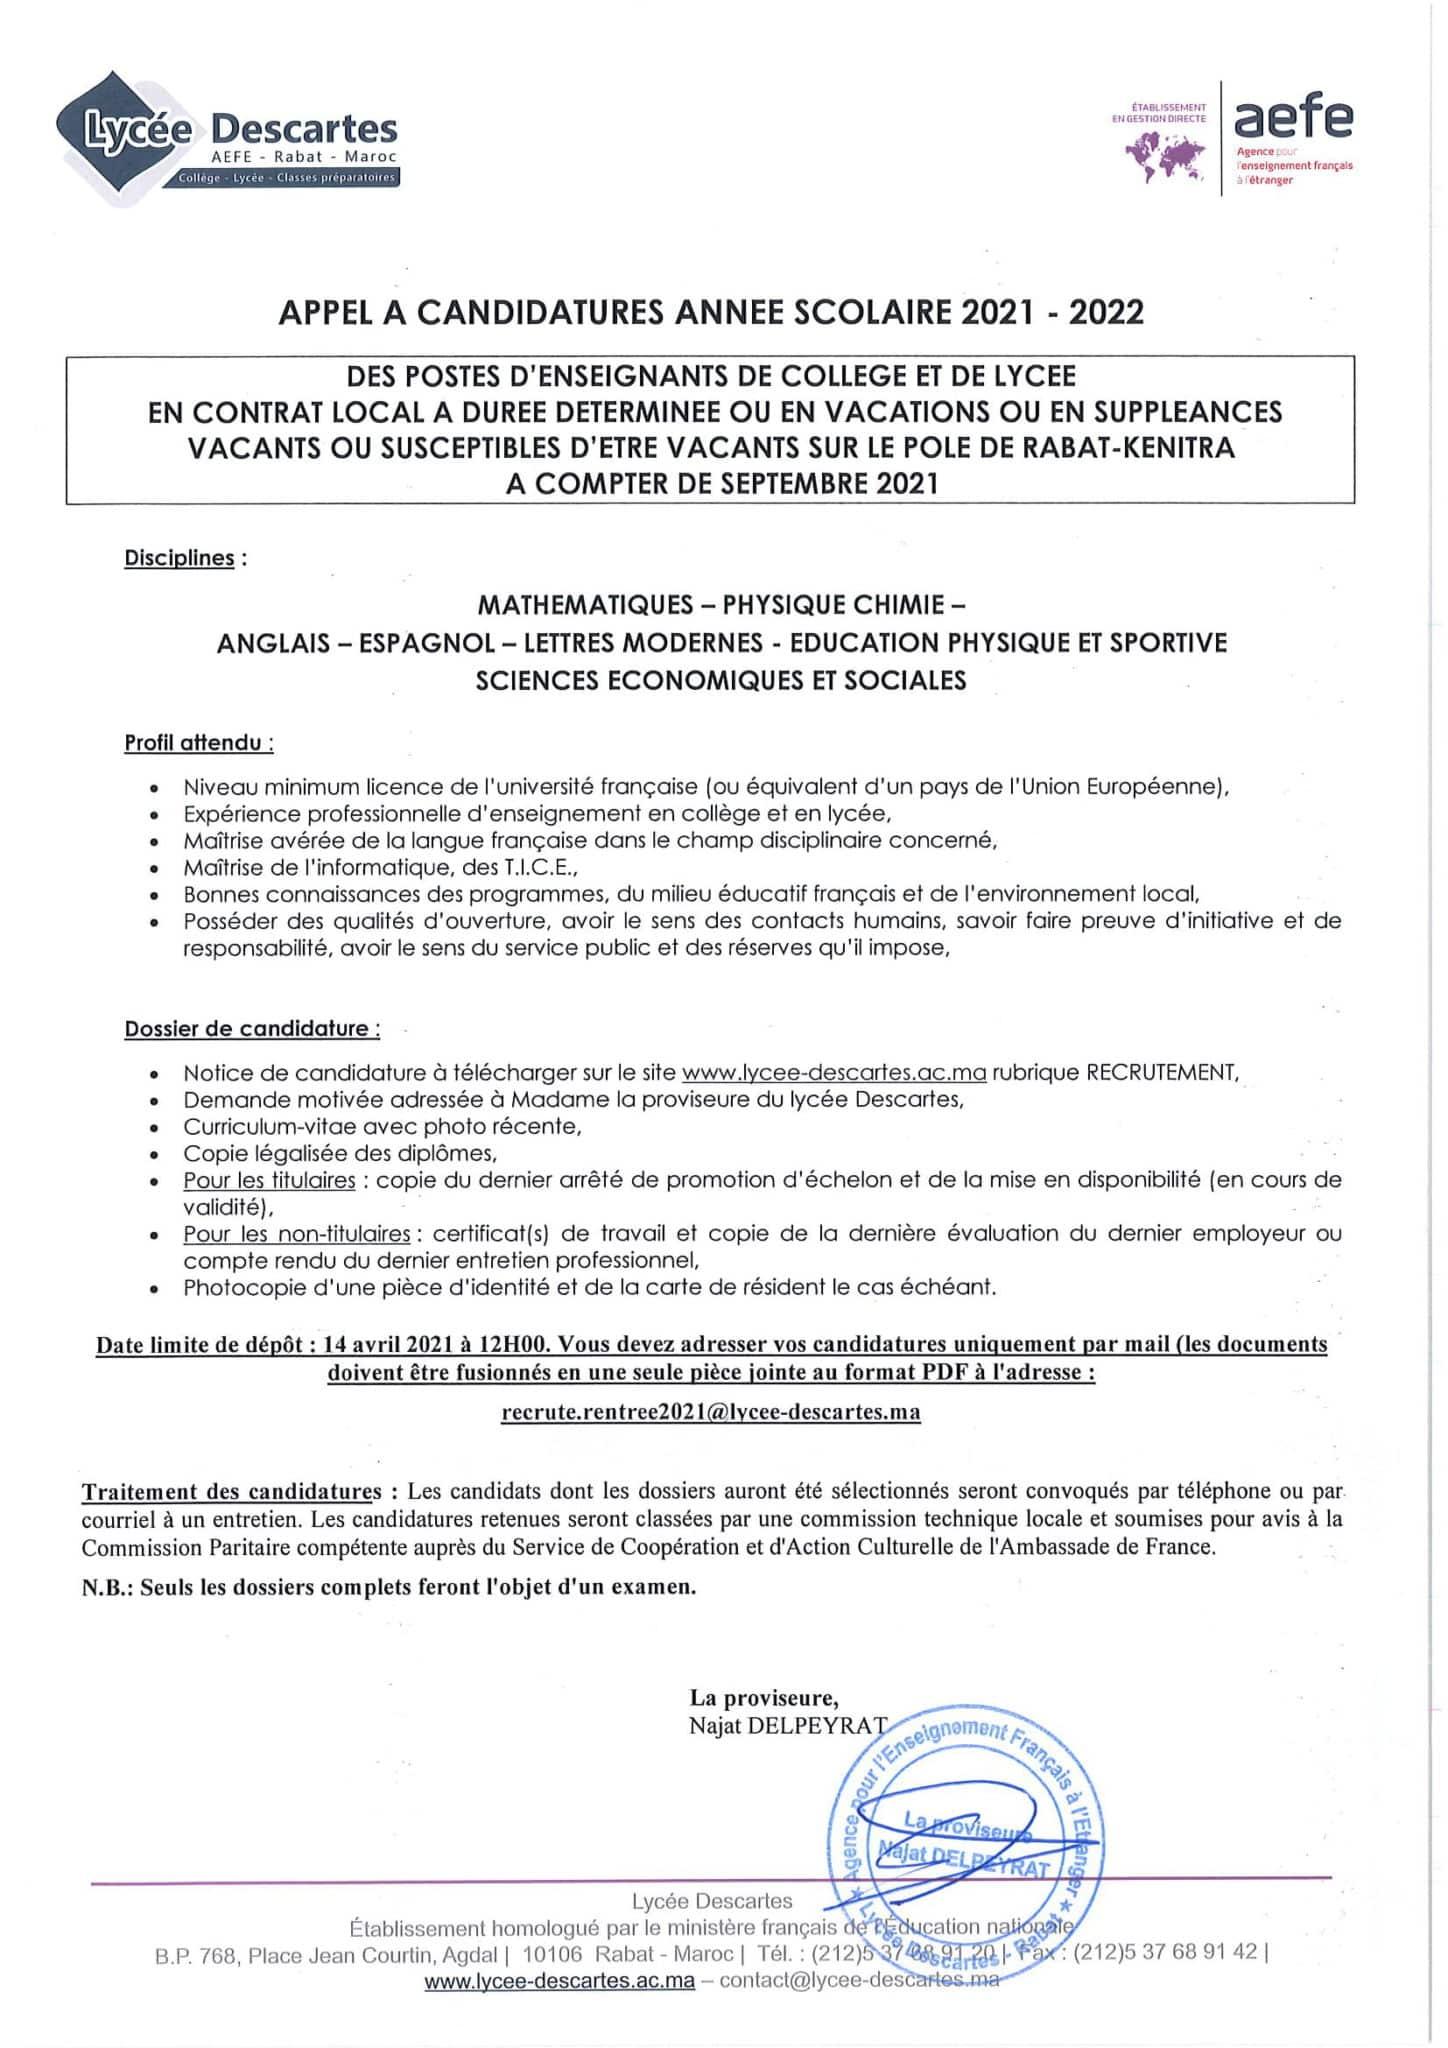 enseignantscollegeetlyceecontratlocal 1 scaled Lycée Descartes recrute Plusieurs Profils